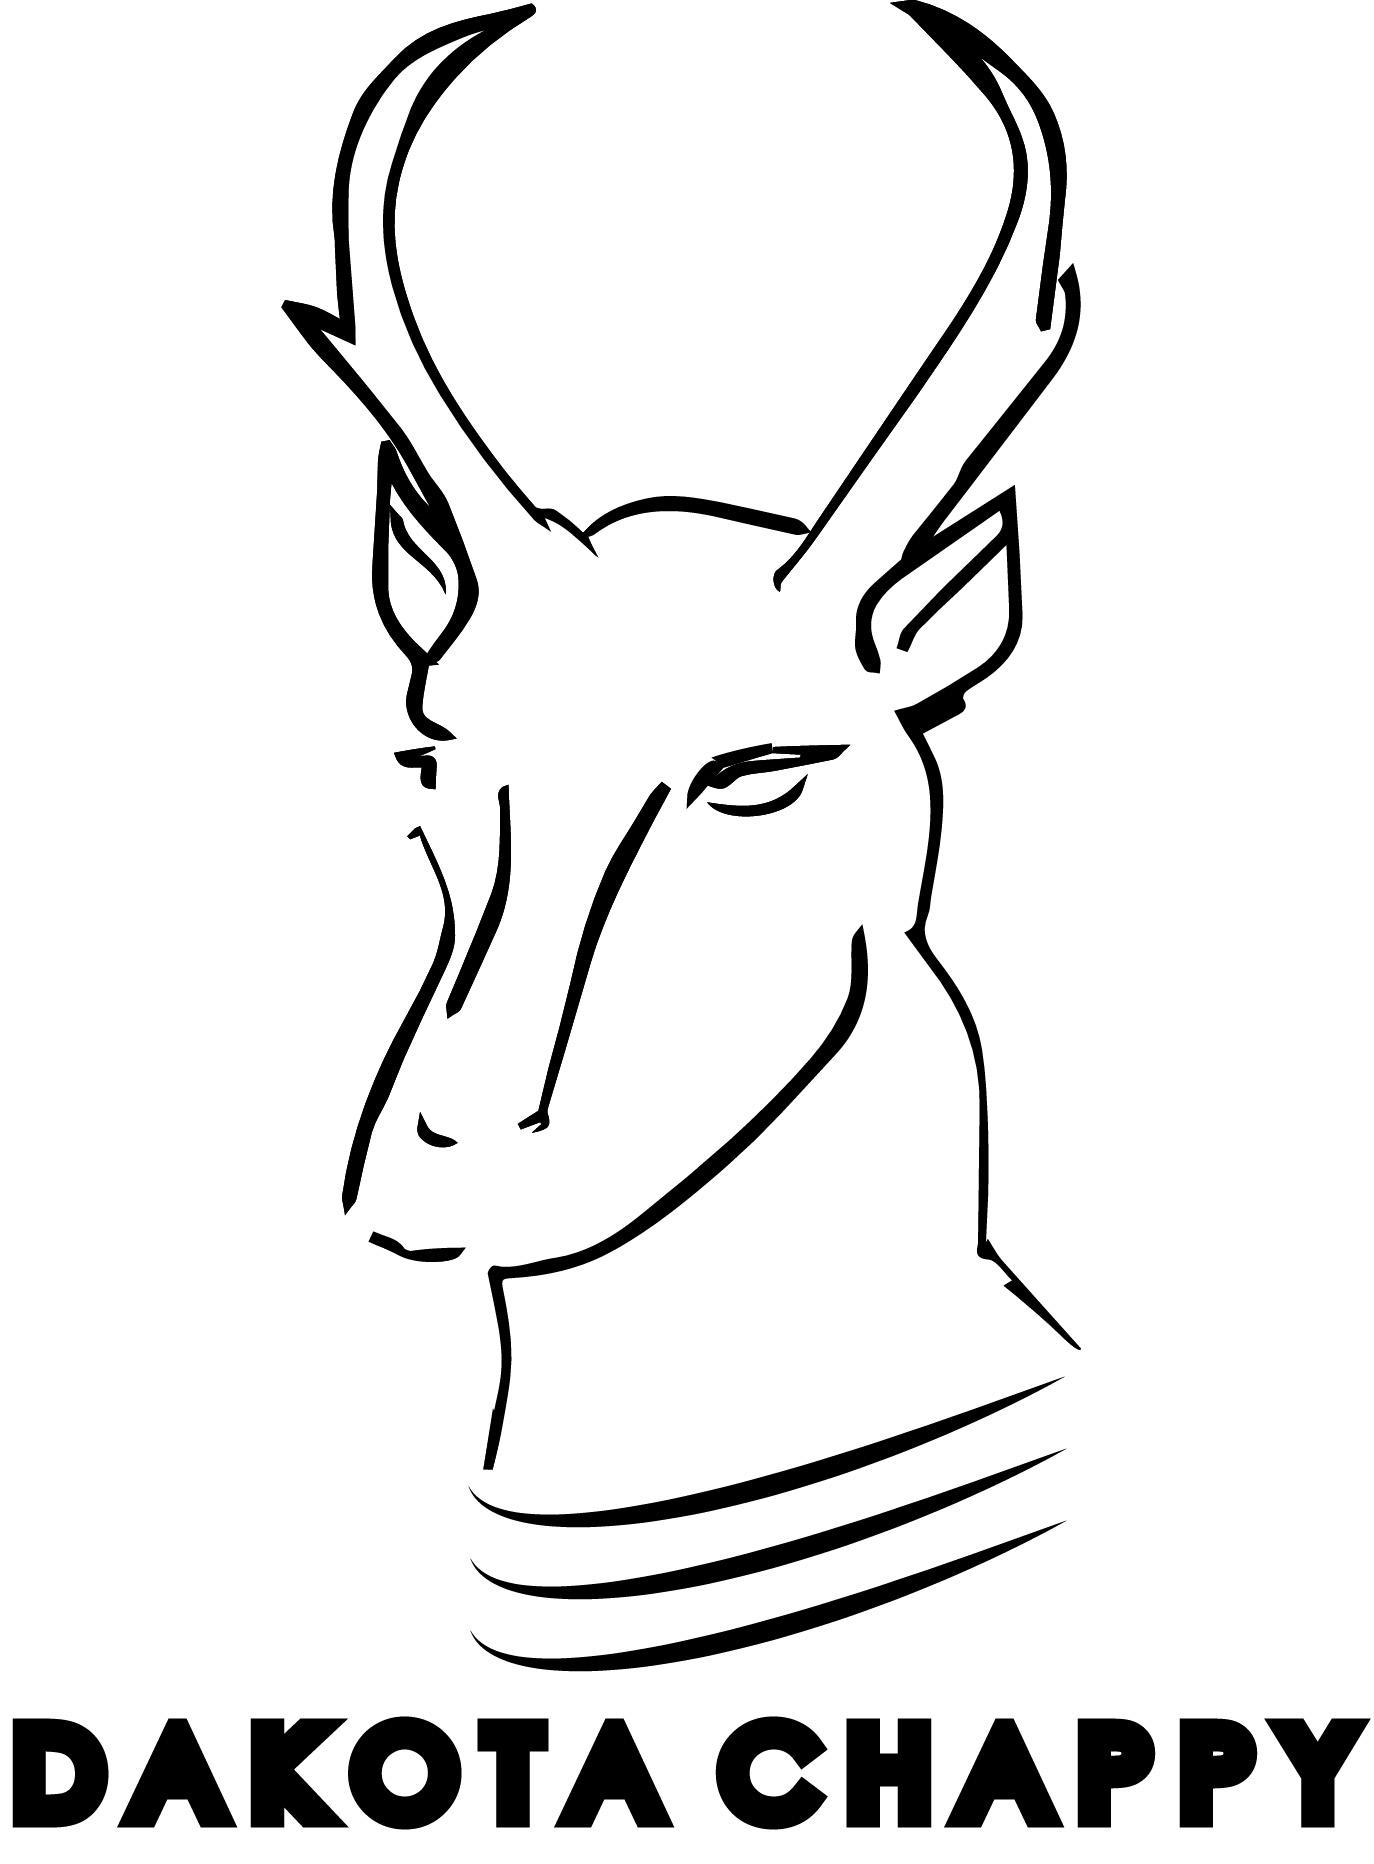 antelopecutout